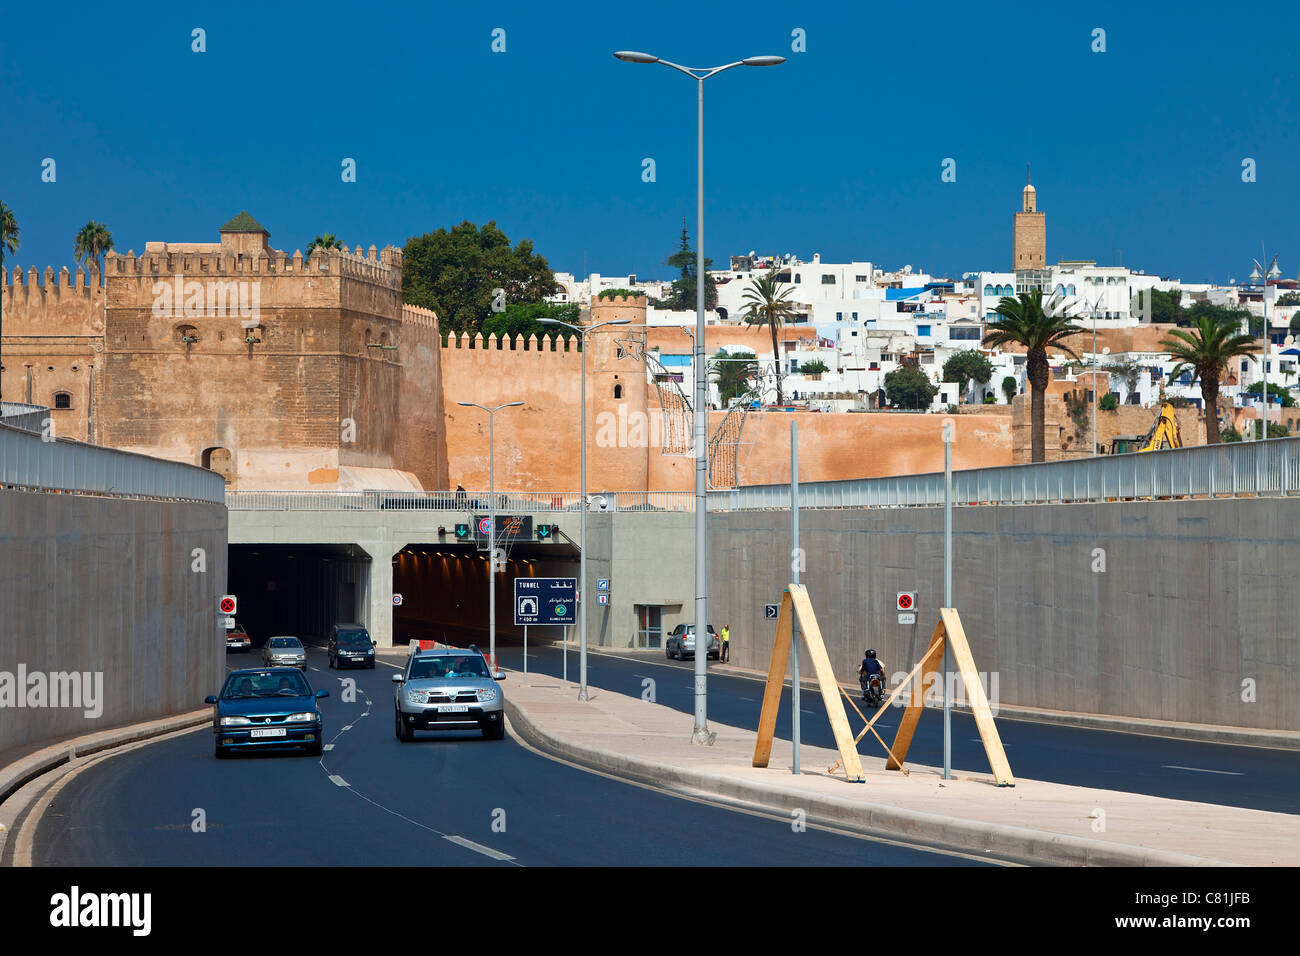 Morocco, Rabat, Tunnel des Oudaias - Stock Image